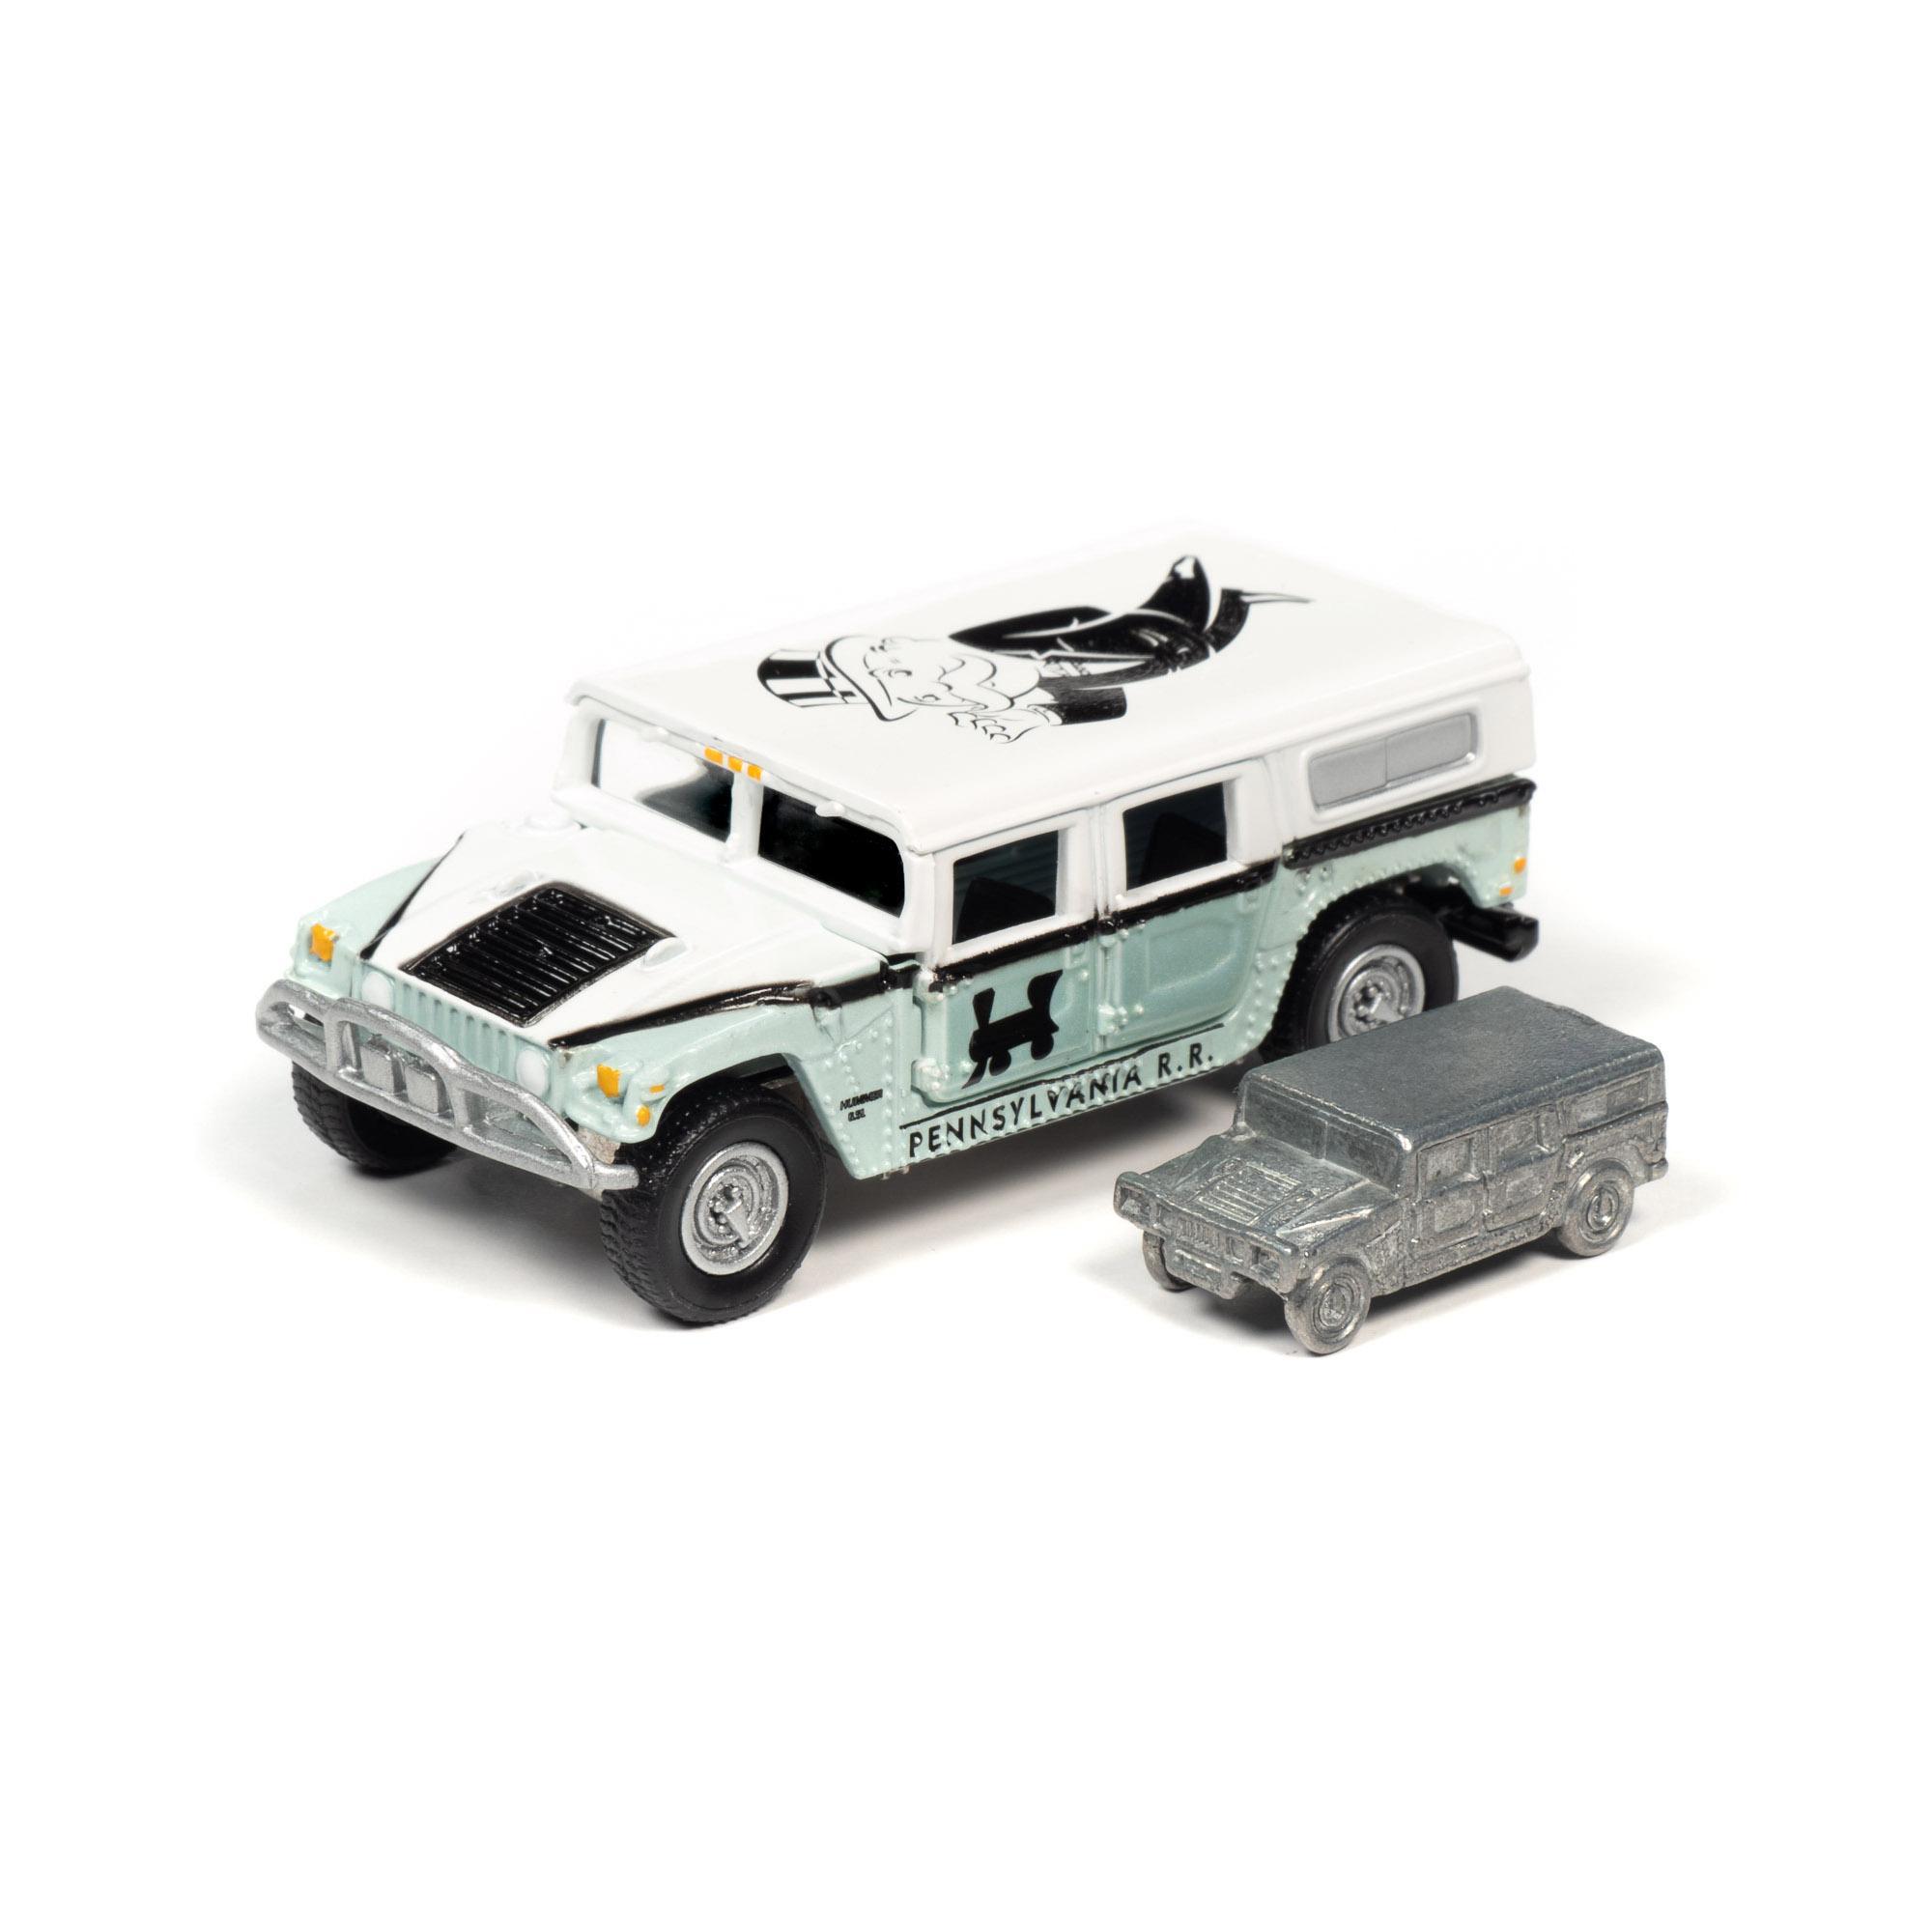 Johnny Lightning Pop Culture Monopoly 2004 Hummer H1 & Token 1:64 Diecast